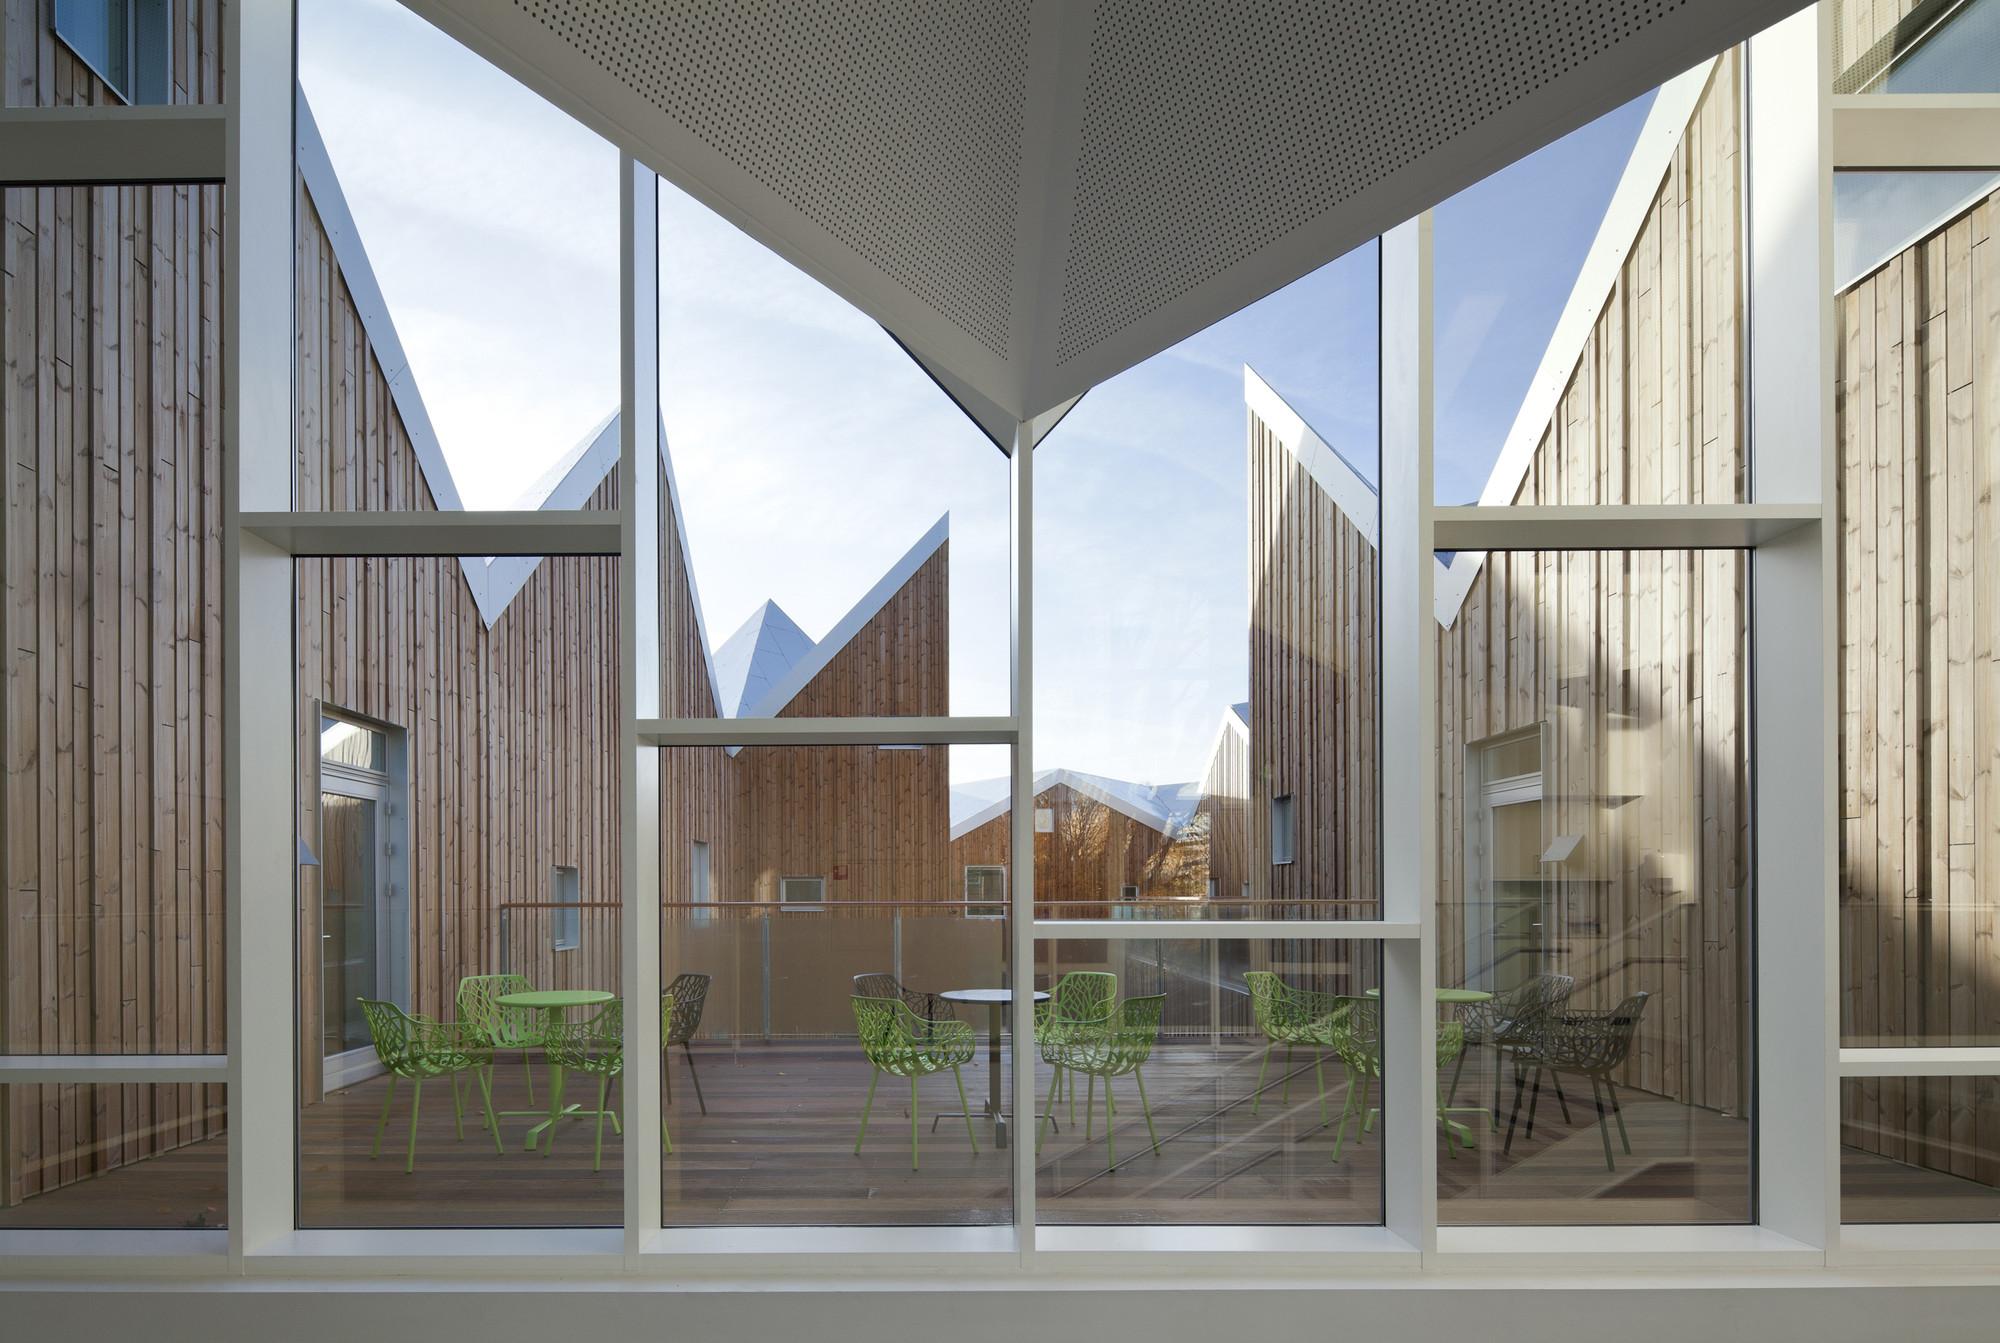 Centro de Cáncer y Salud / Nord Architects